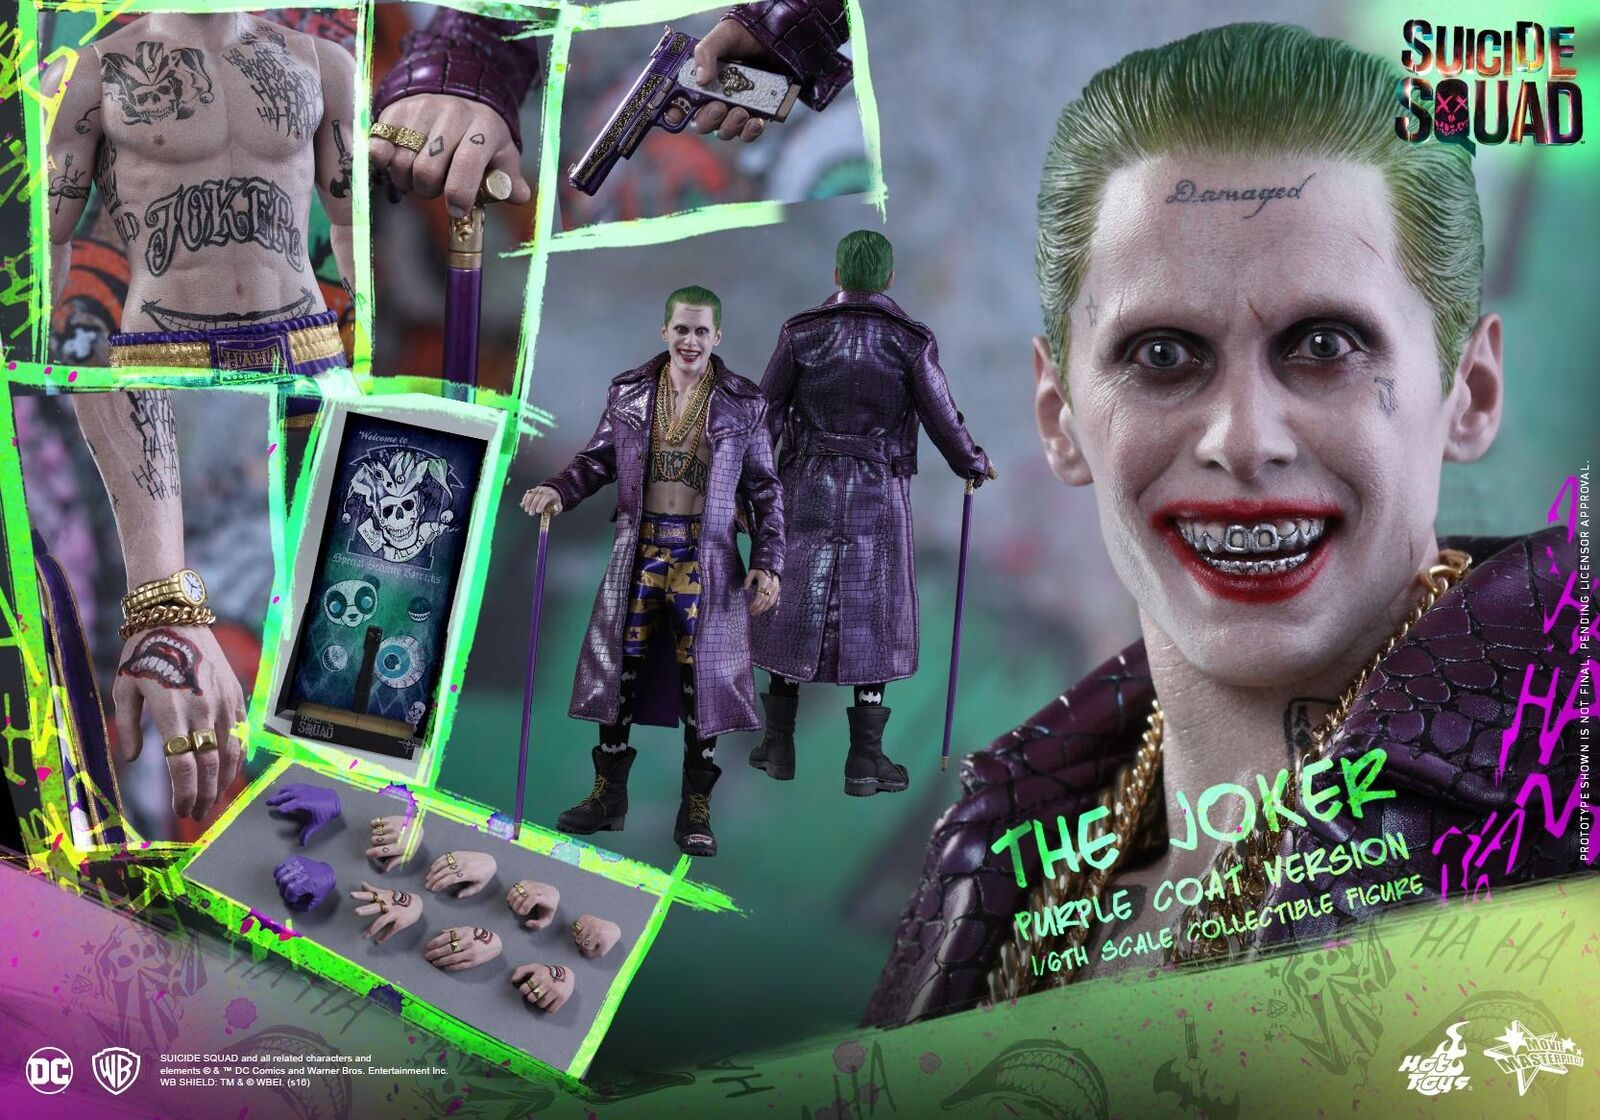 heta leksaker 1  6 DC Suicide S382 Joker lila Coat Ver Figur Brand Ny